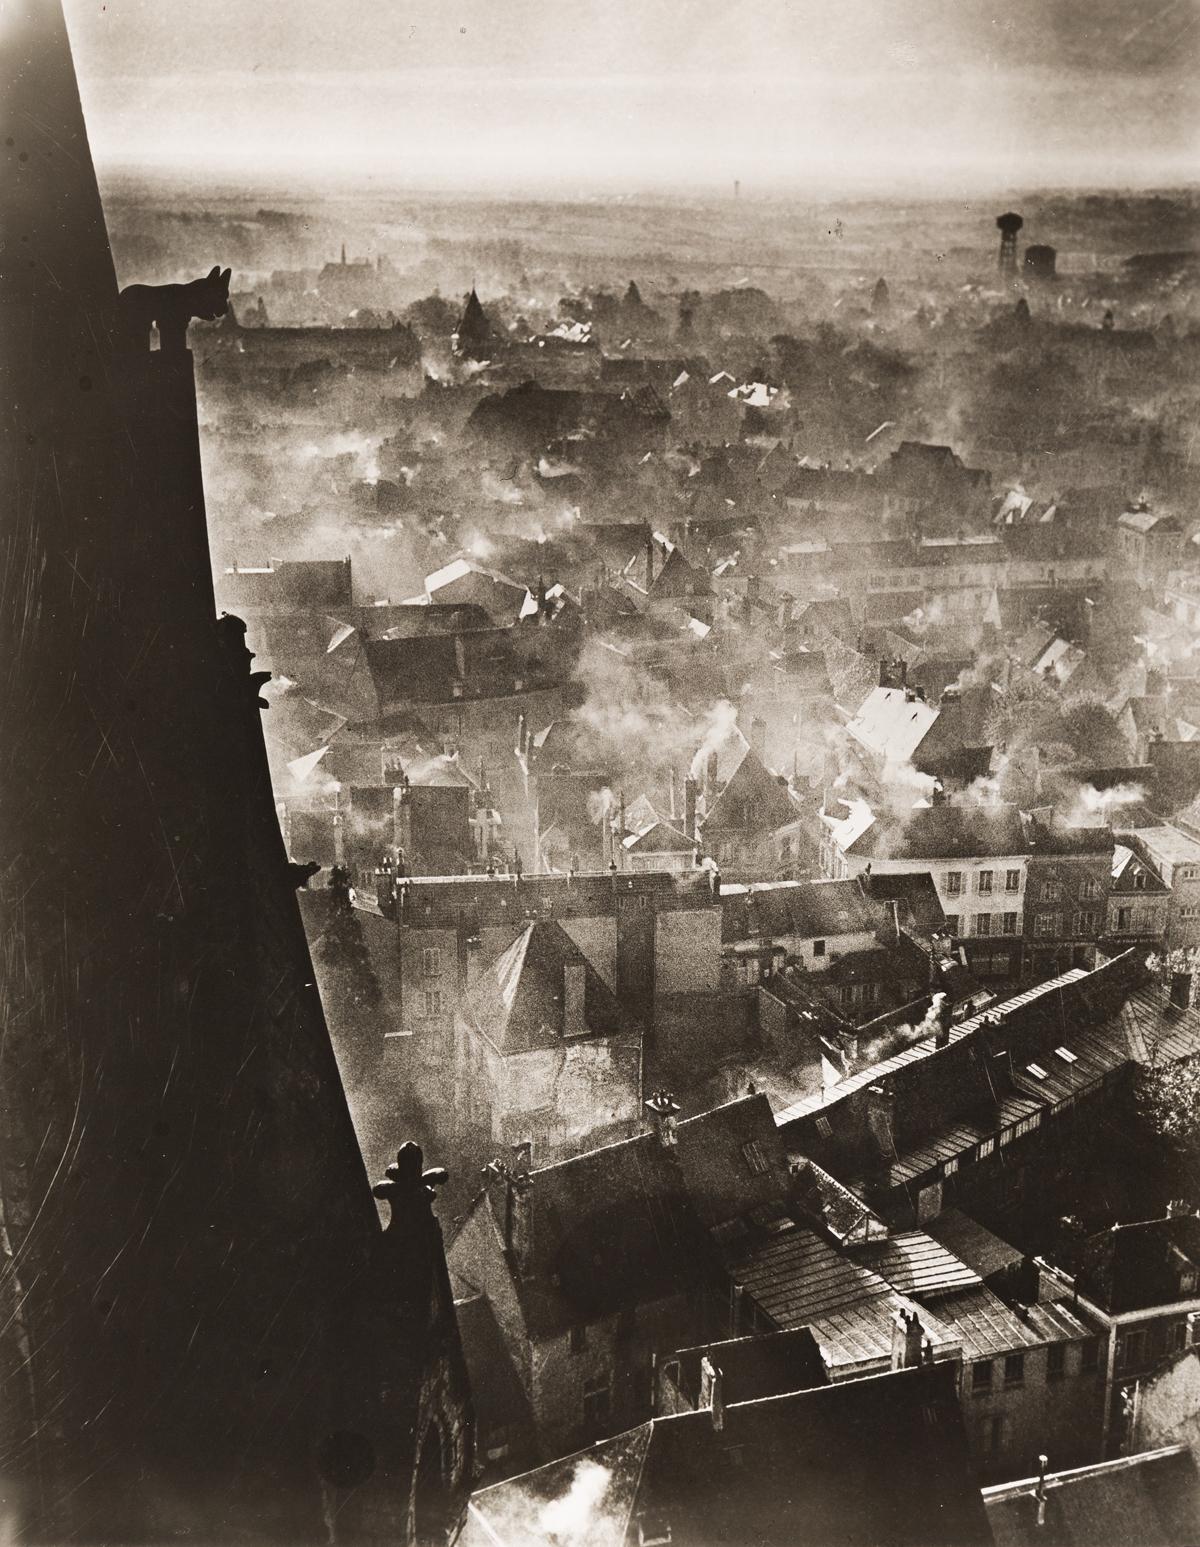 BRASSAÏ-(1899-1984)-Chartres-en-Hiver-[Chartes-in-Winter]